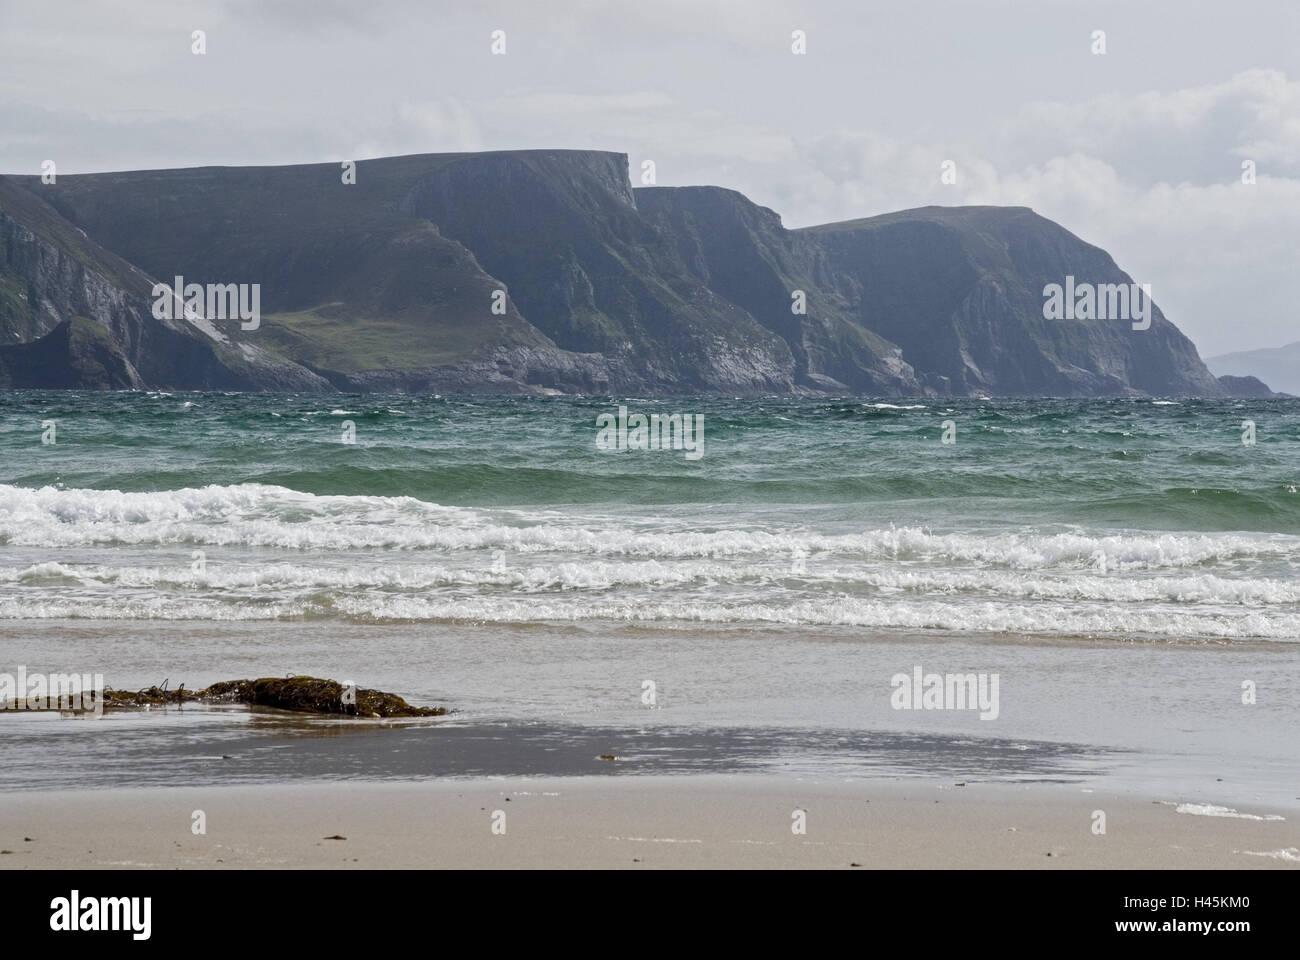 Ireland, Achilles Iceland, Keel, beach, sea, cliffs, Connacht, steep coast, coast, sea bay, waters, heaven, cloudies, - Stock Image